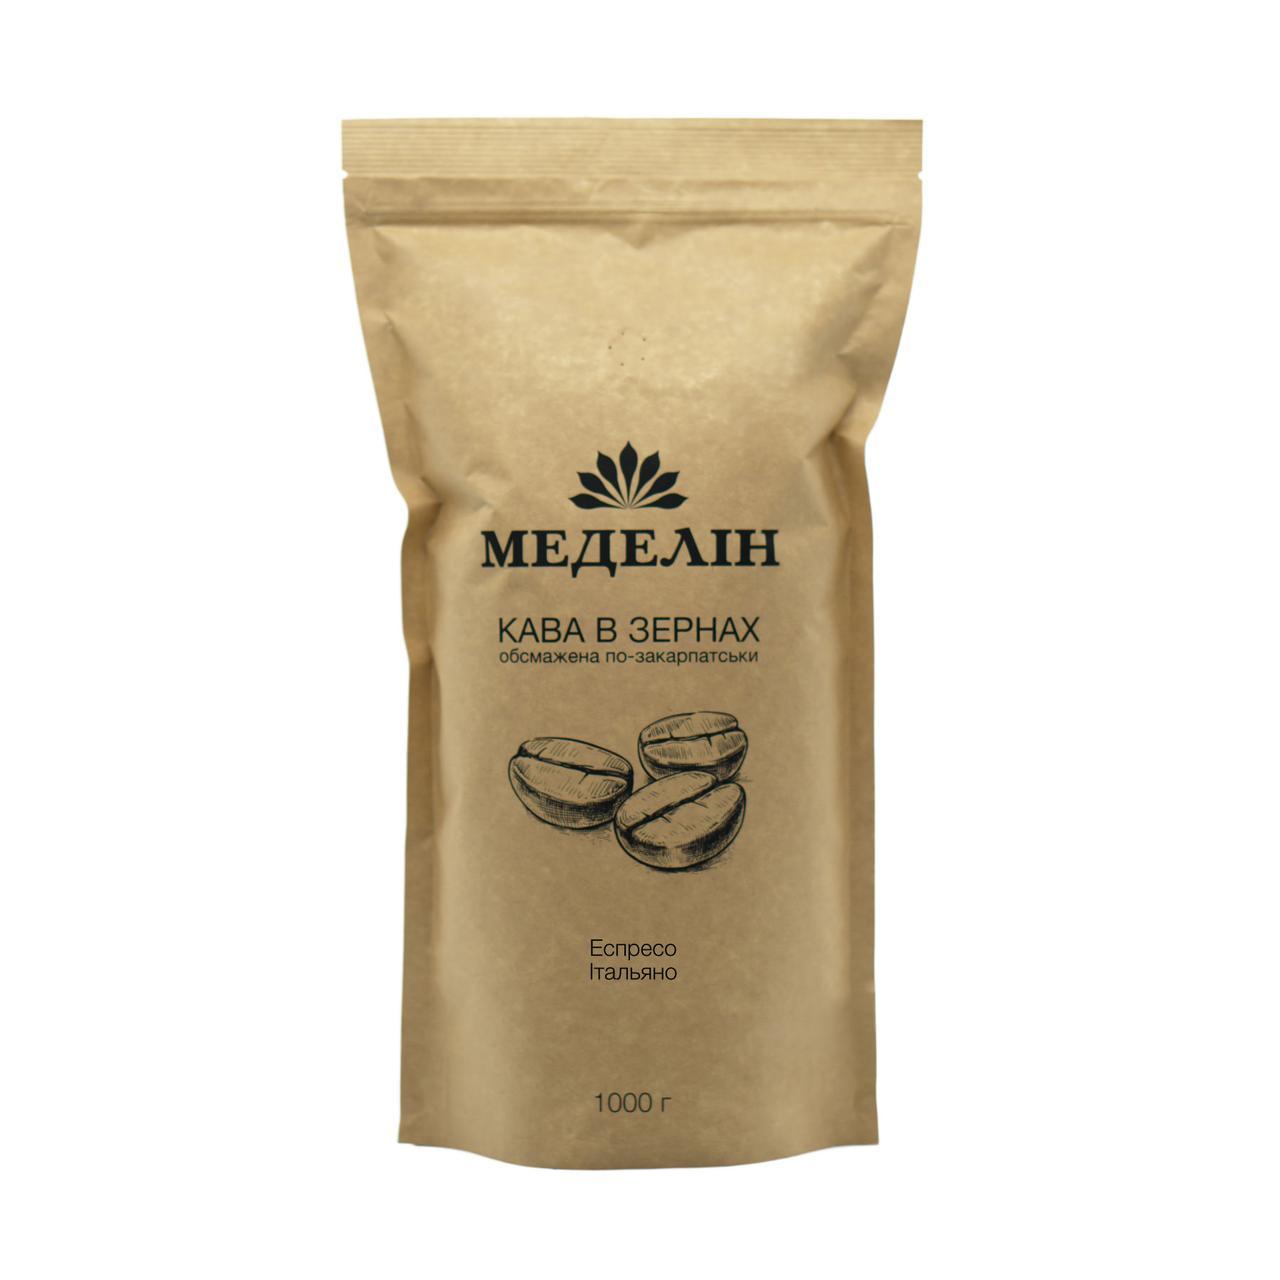 Кава Меделін espreso italiano, 1000 г